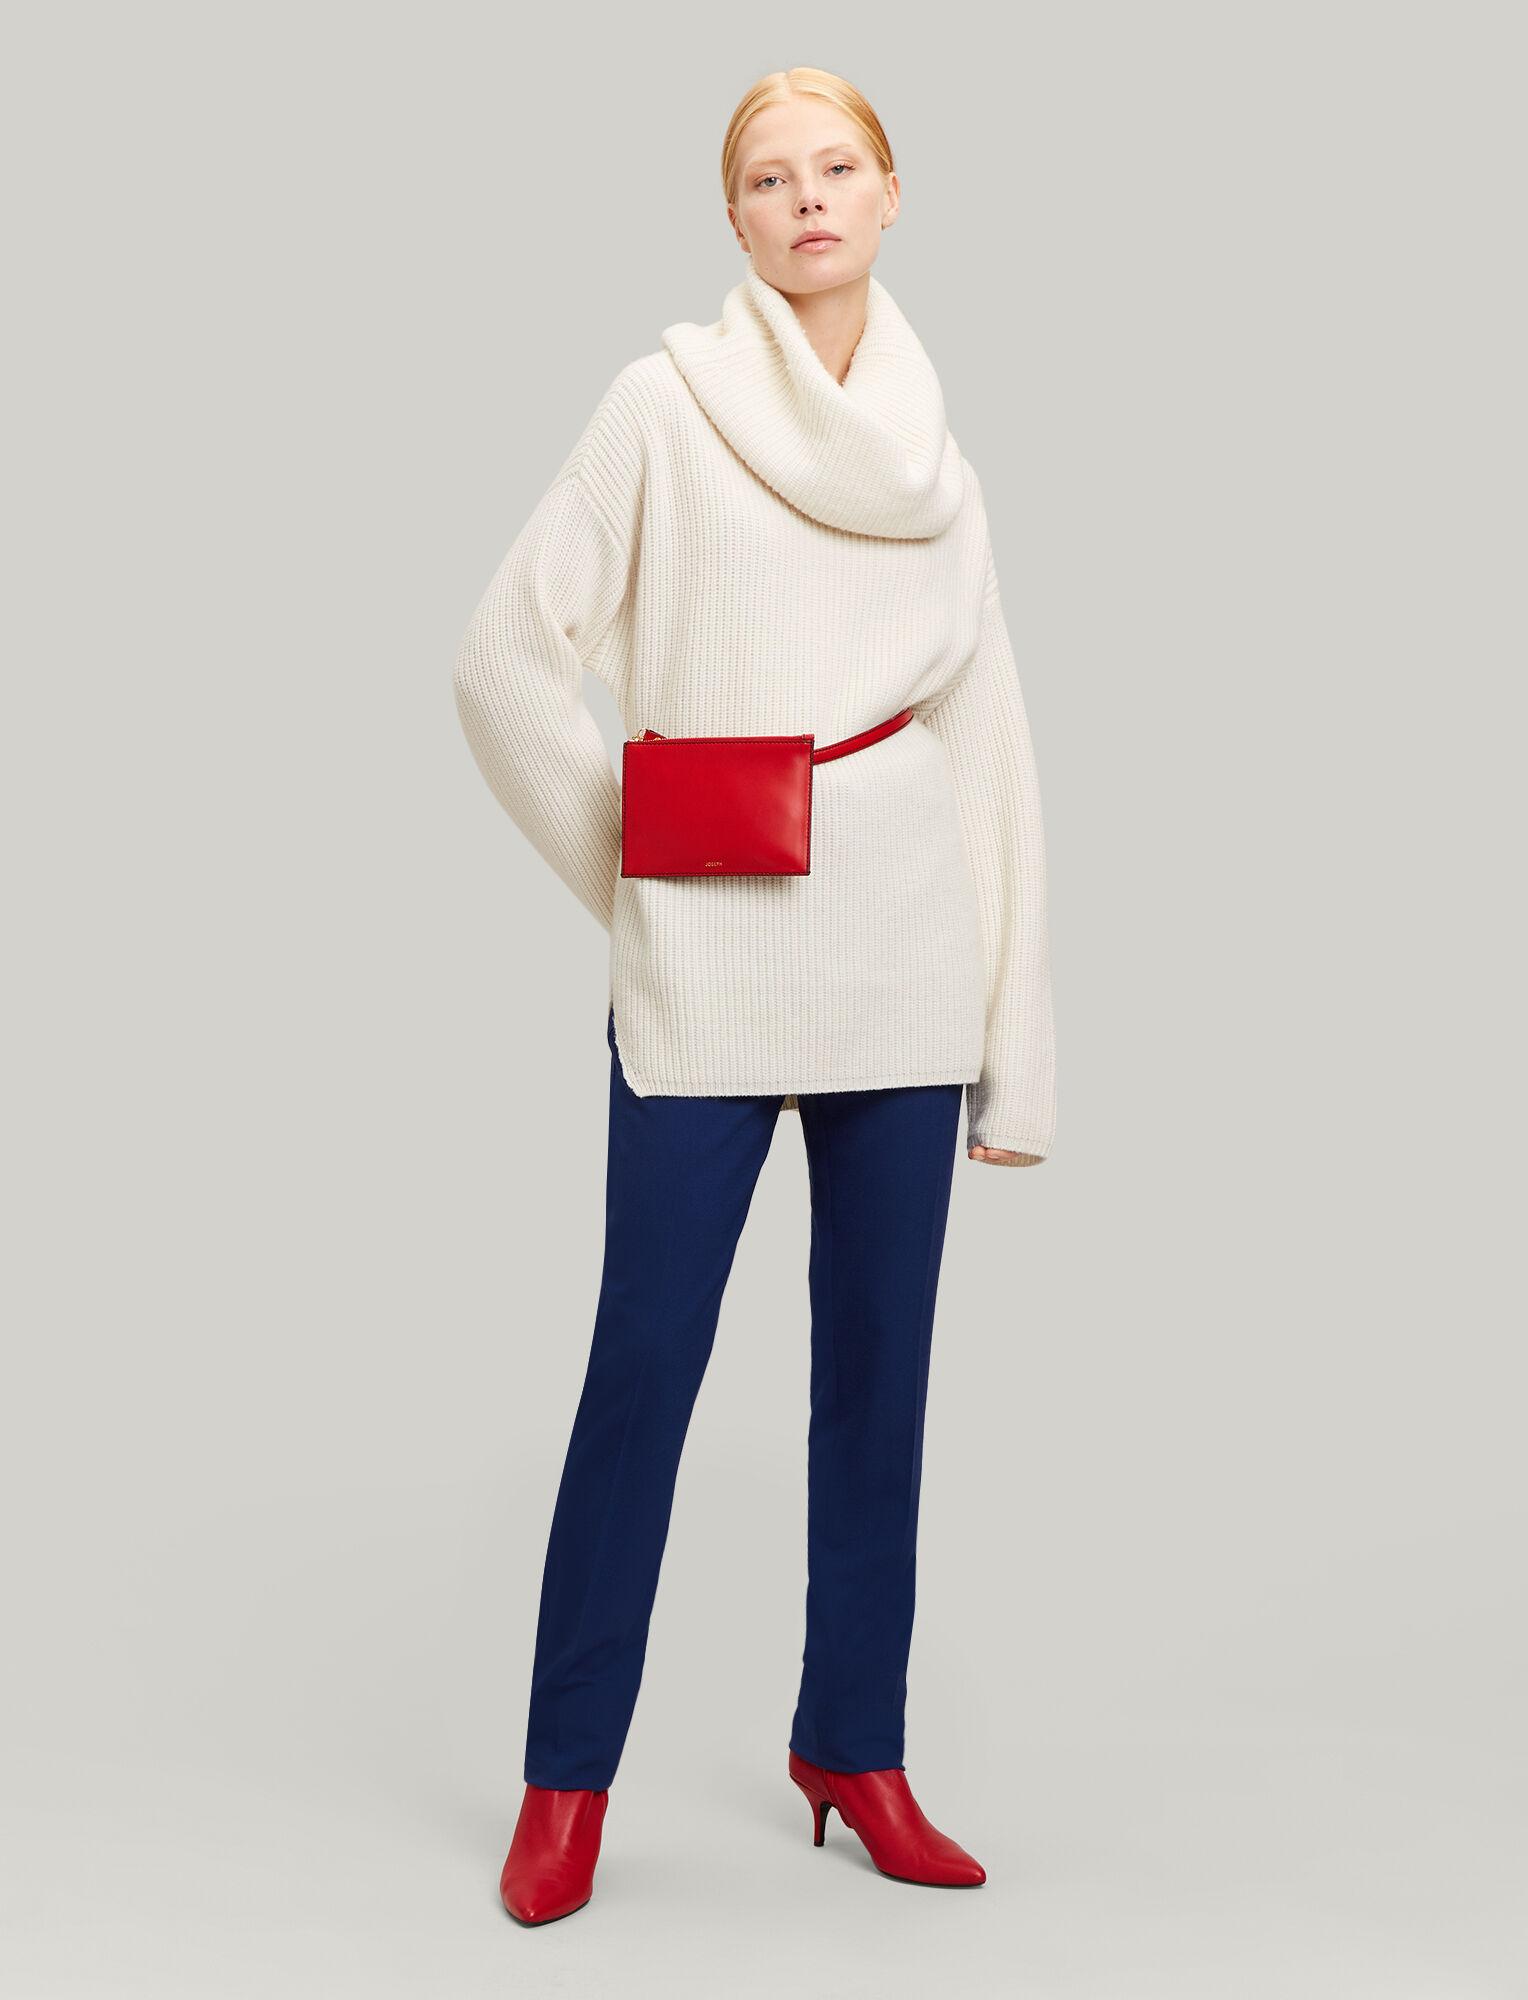 Joseph, Zoran Comfort Wool Trousers, in INDIGO